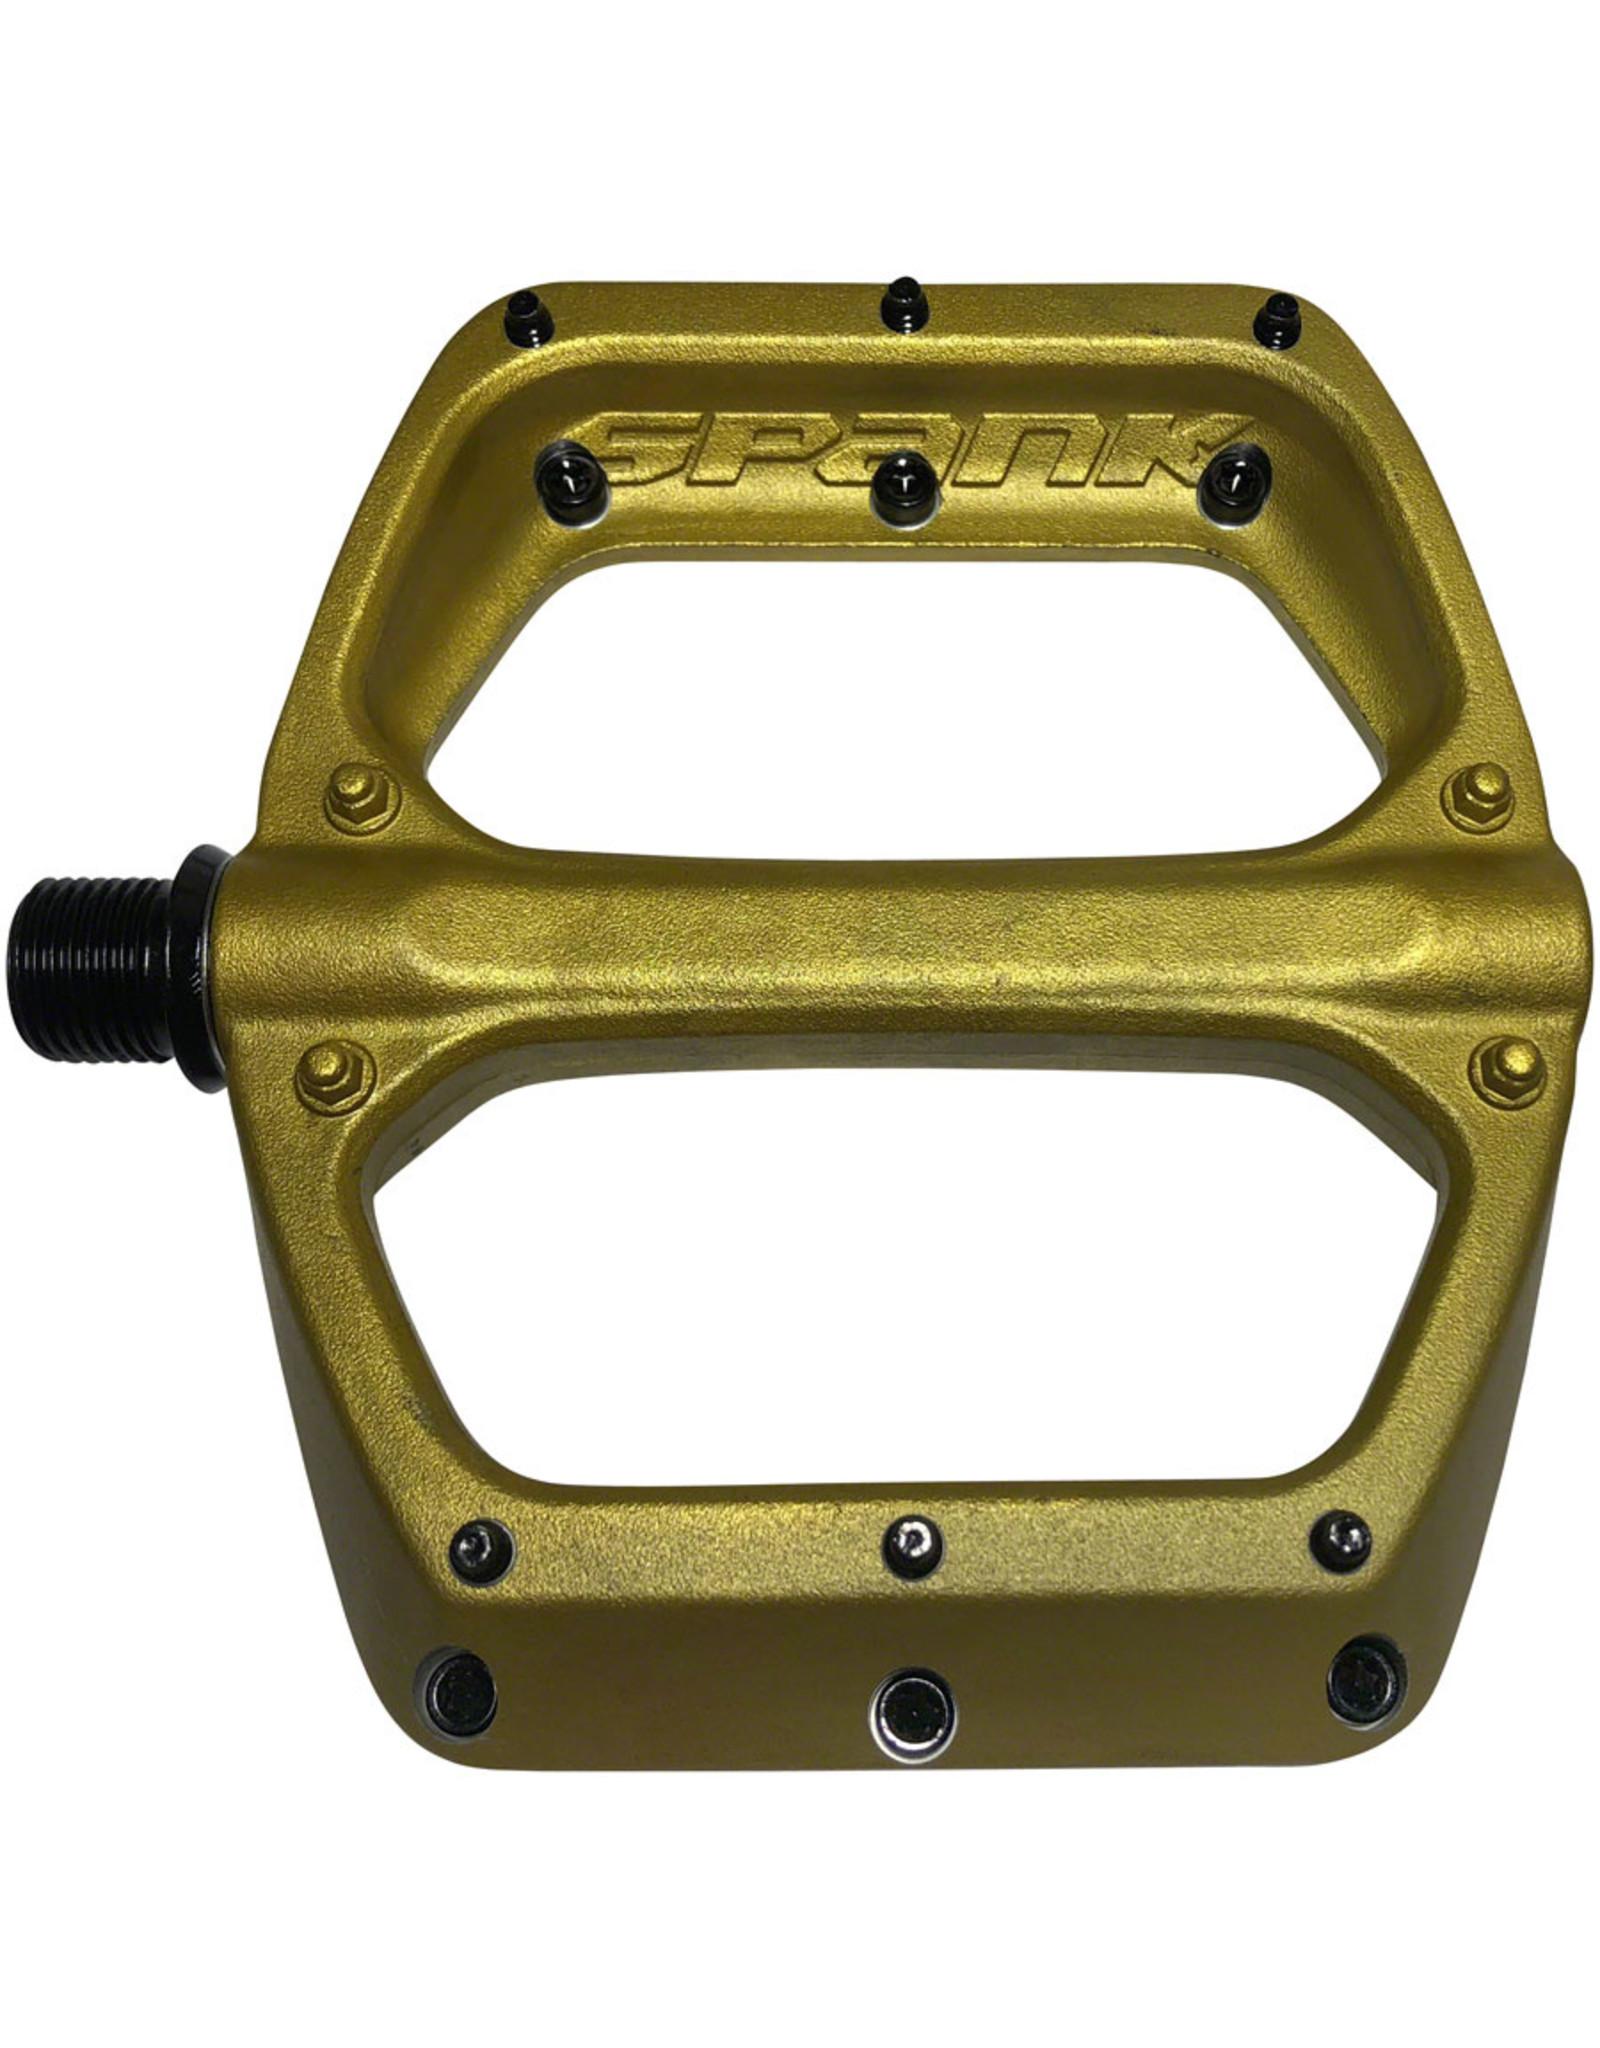 "Spank Spank Spoon DC Pedals - Platform, Aluminum, 9/16"", Gold"